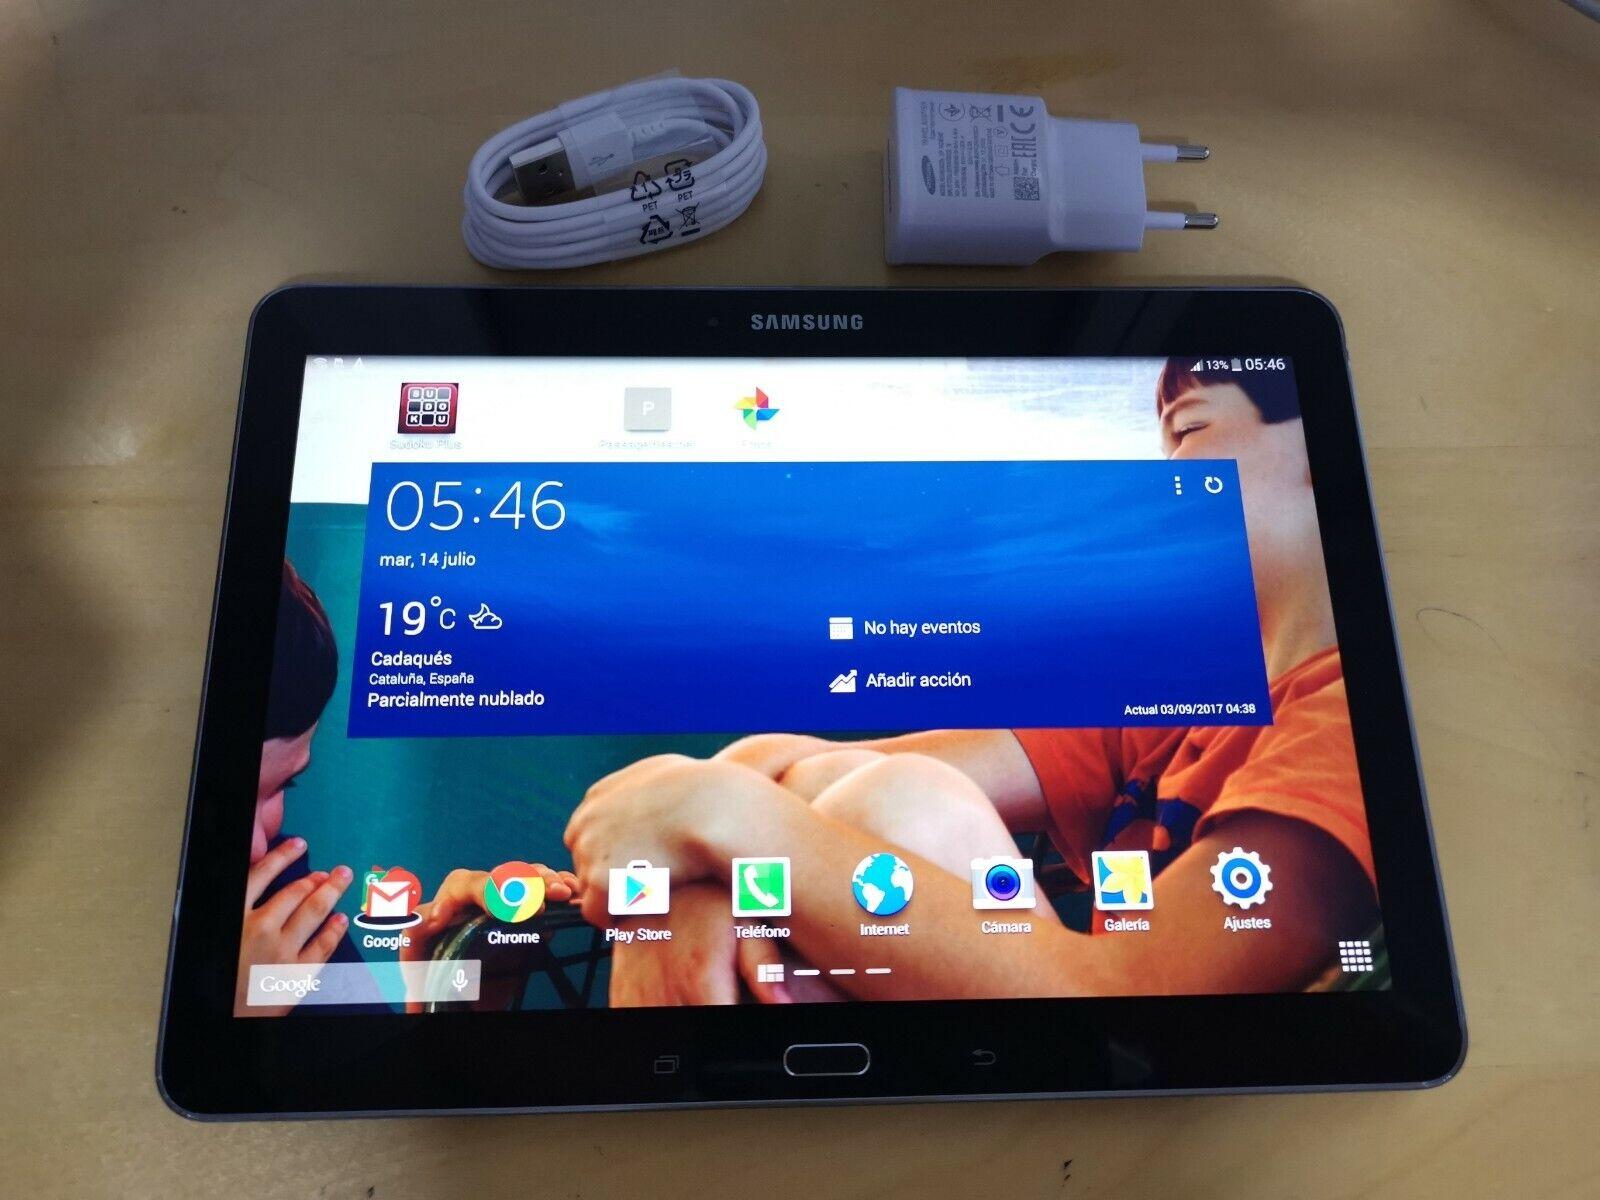 Tablette samsung galaxy tab pro 16gb 10.1